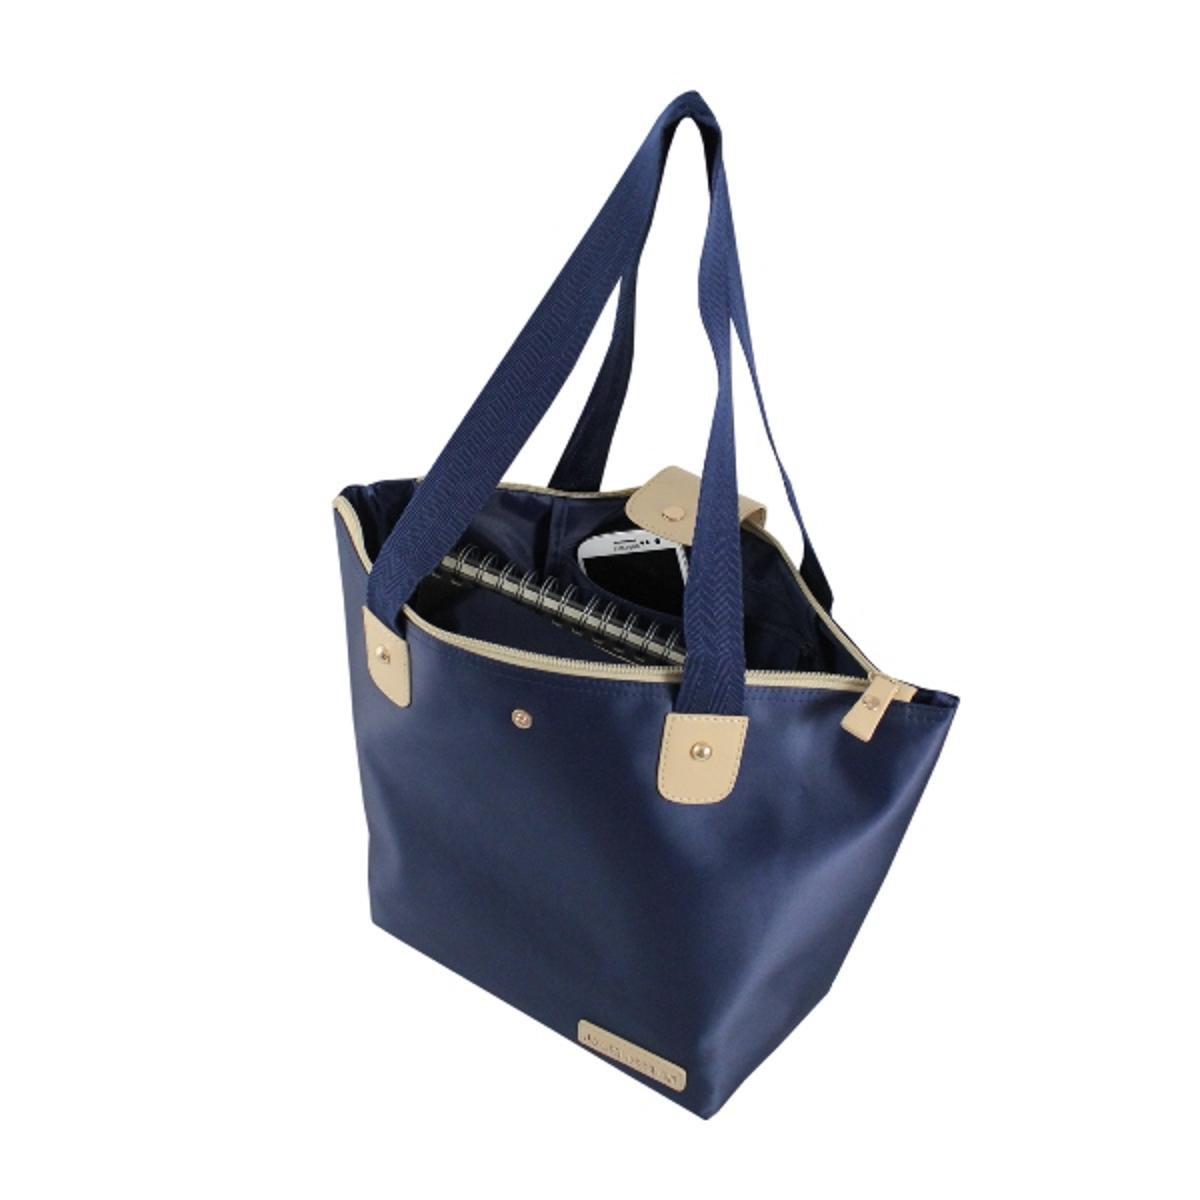 Escuro Bolsa Azul Microfibra Bolsa Dobrável Dobrável Design Jacki 0q0gOw6